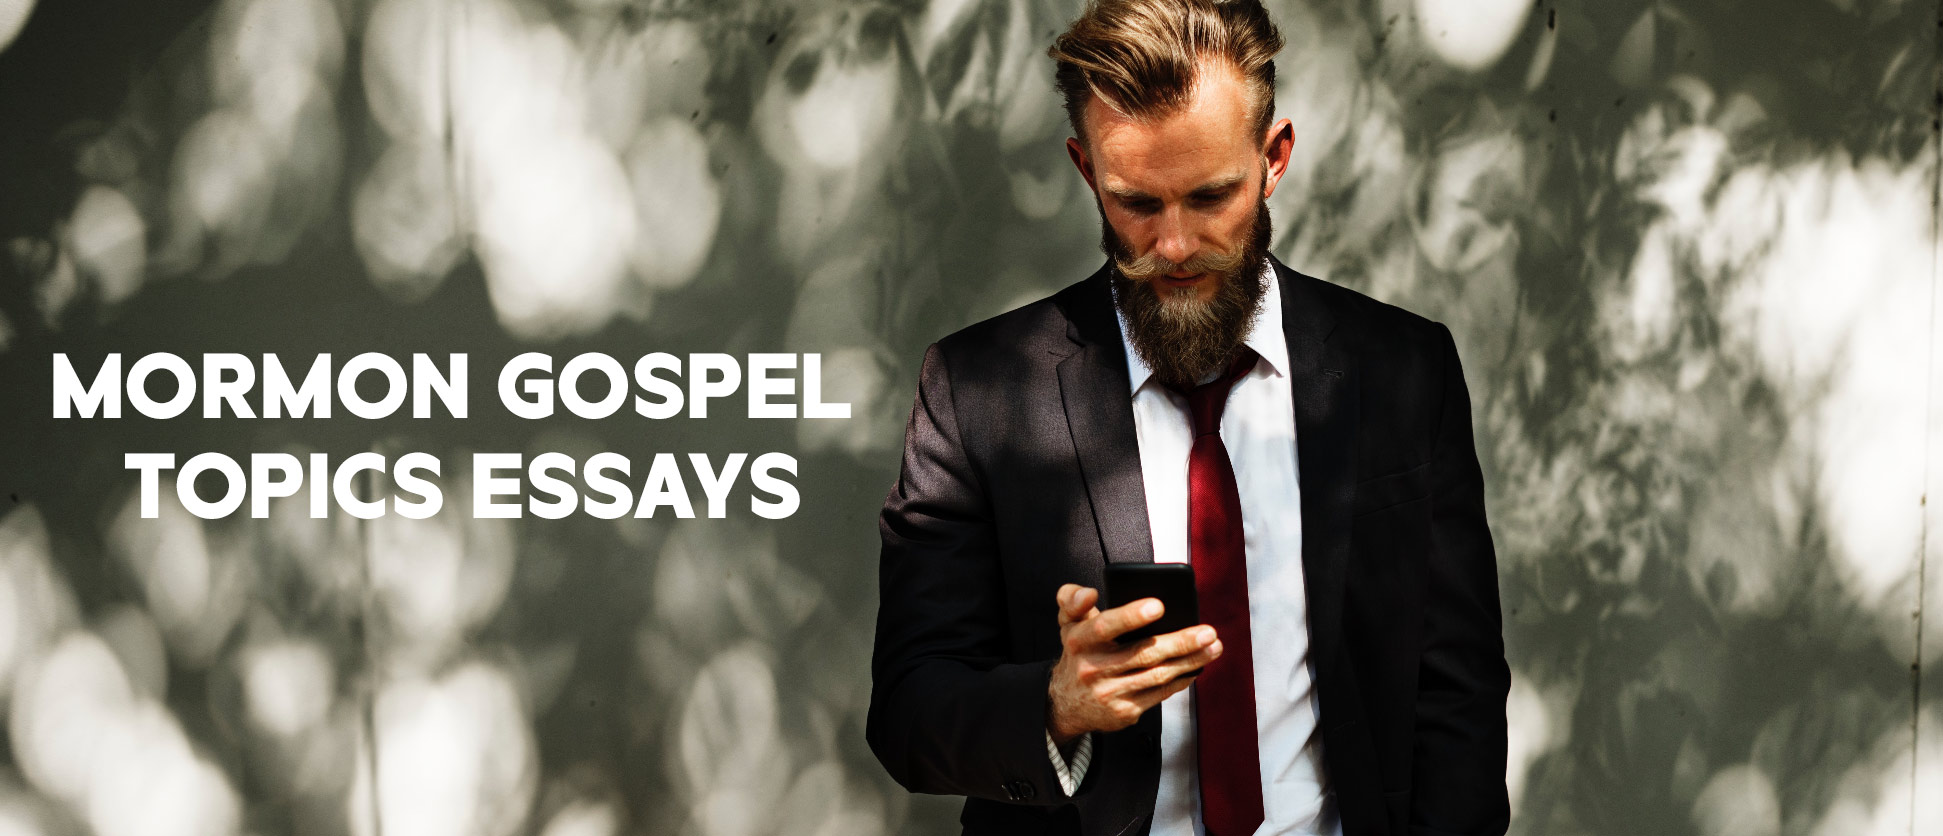 015 Mormon Essays Essay Example Lds Gospel Exceptional Lds.org Book Of Abraham Mormonthink Full